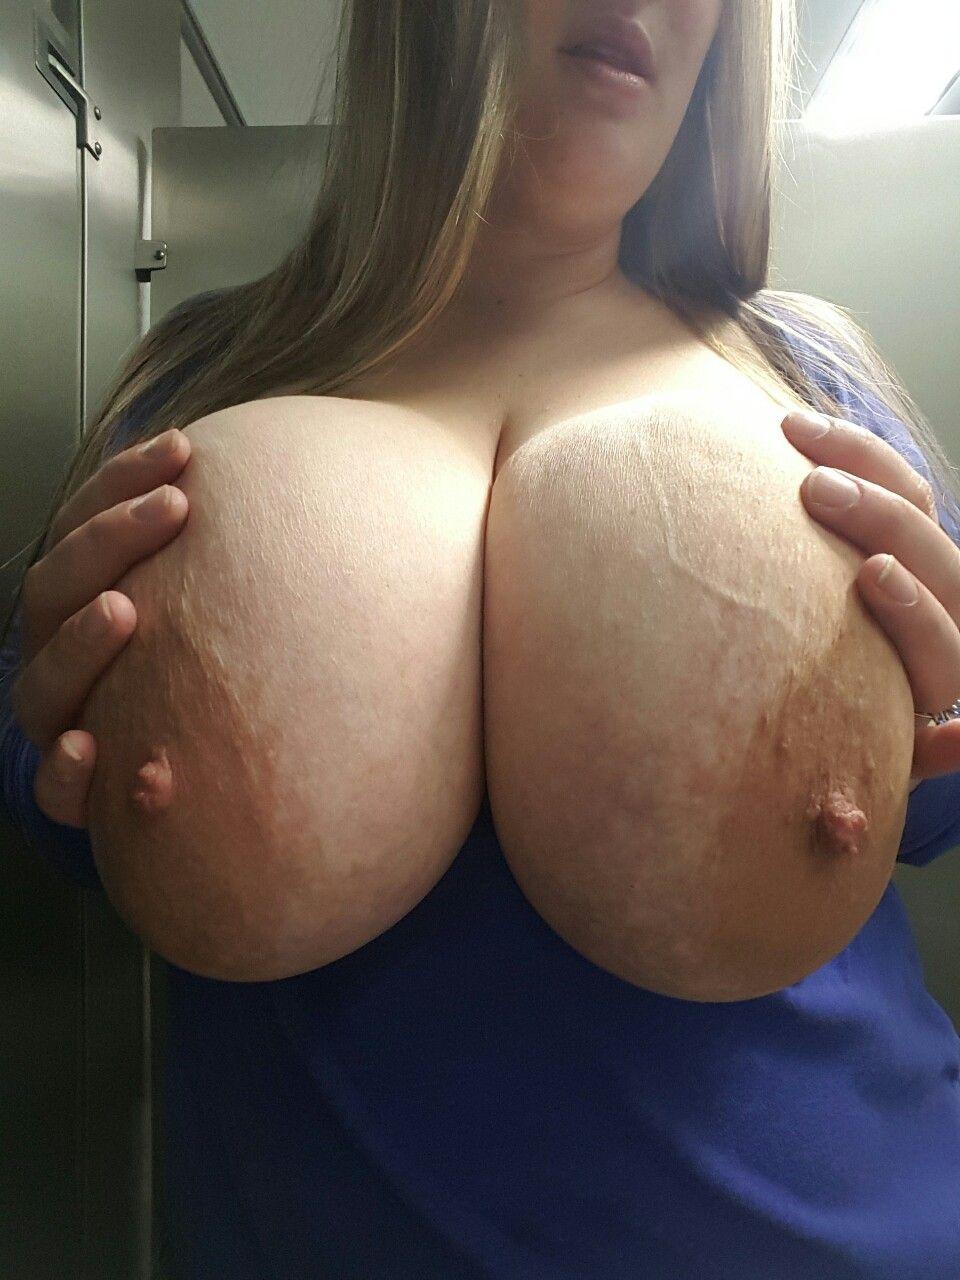 Brutal gif booty porn